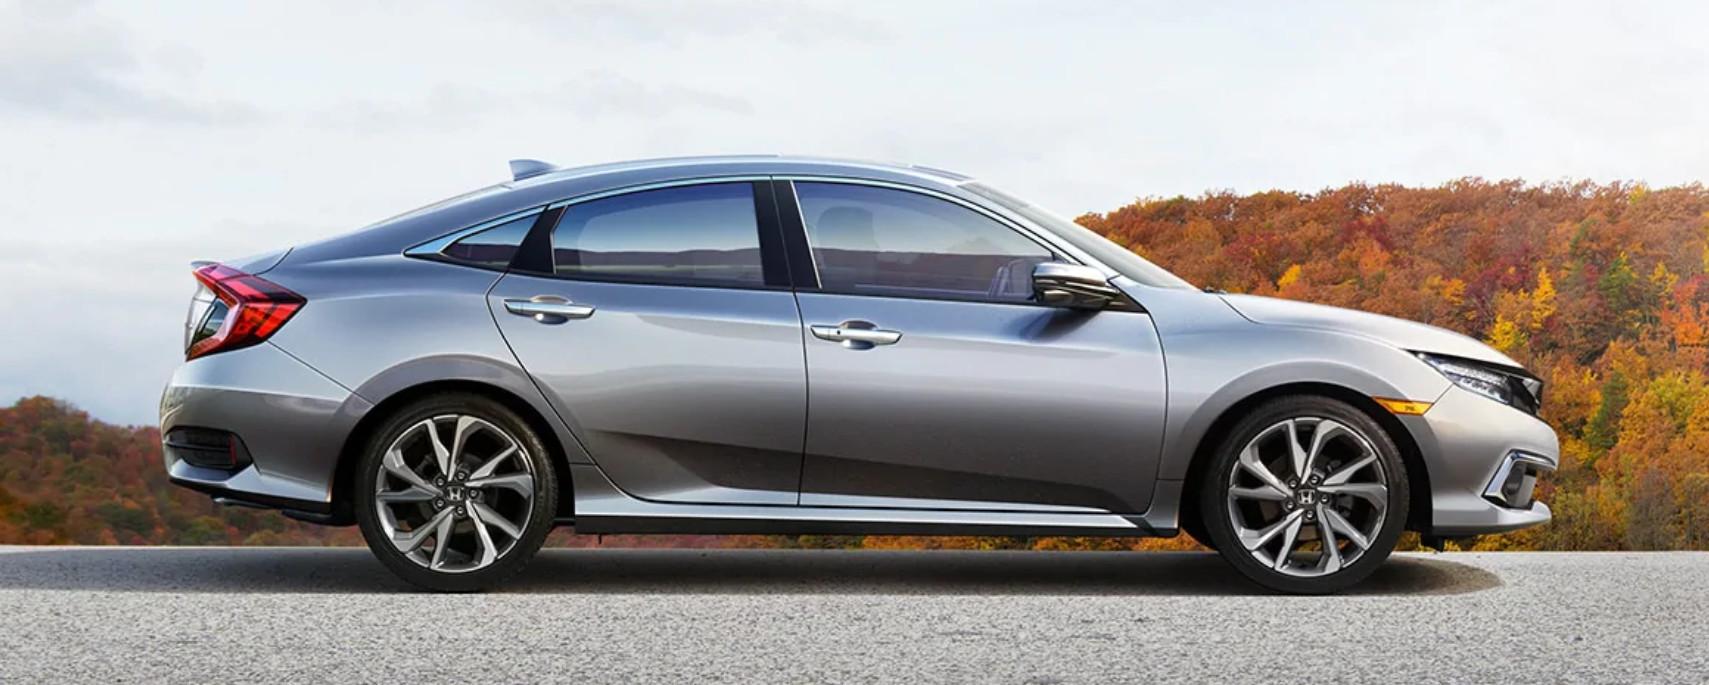 2020 Honda Civic Lease in Elgin, IL